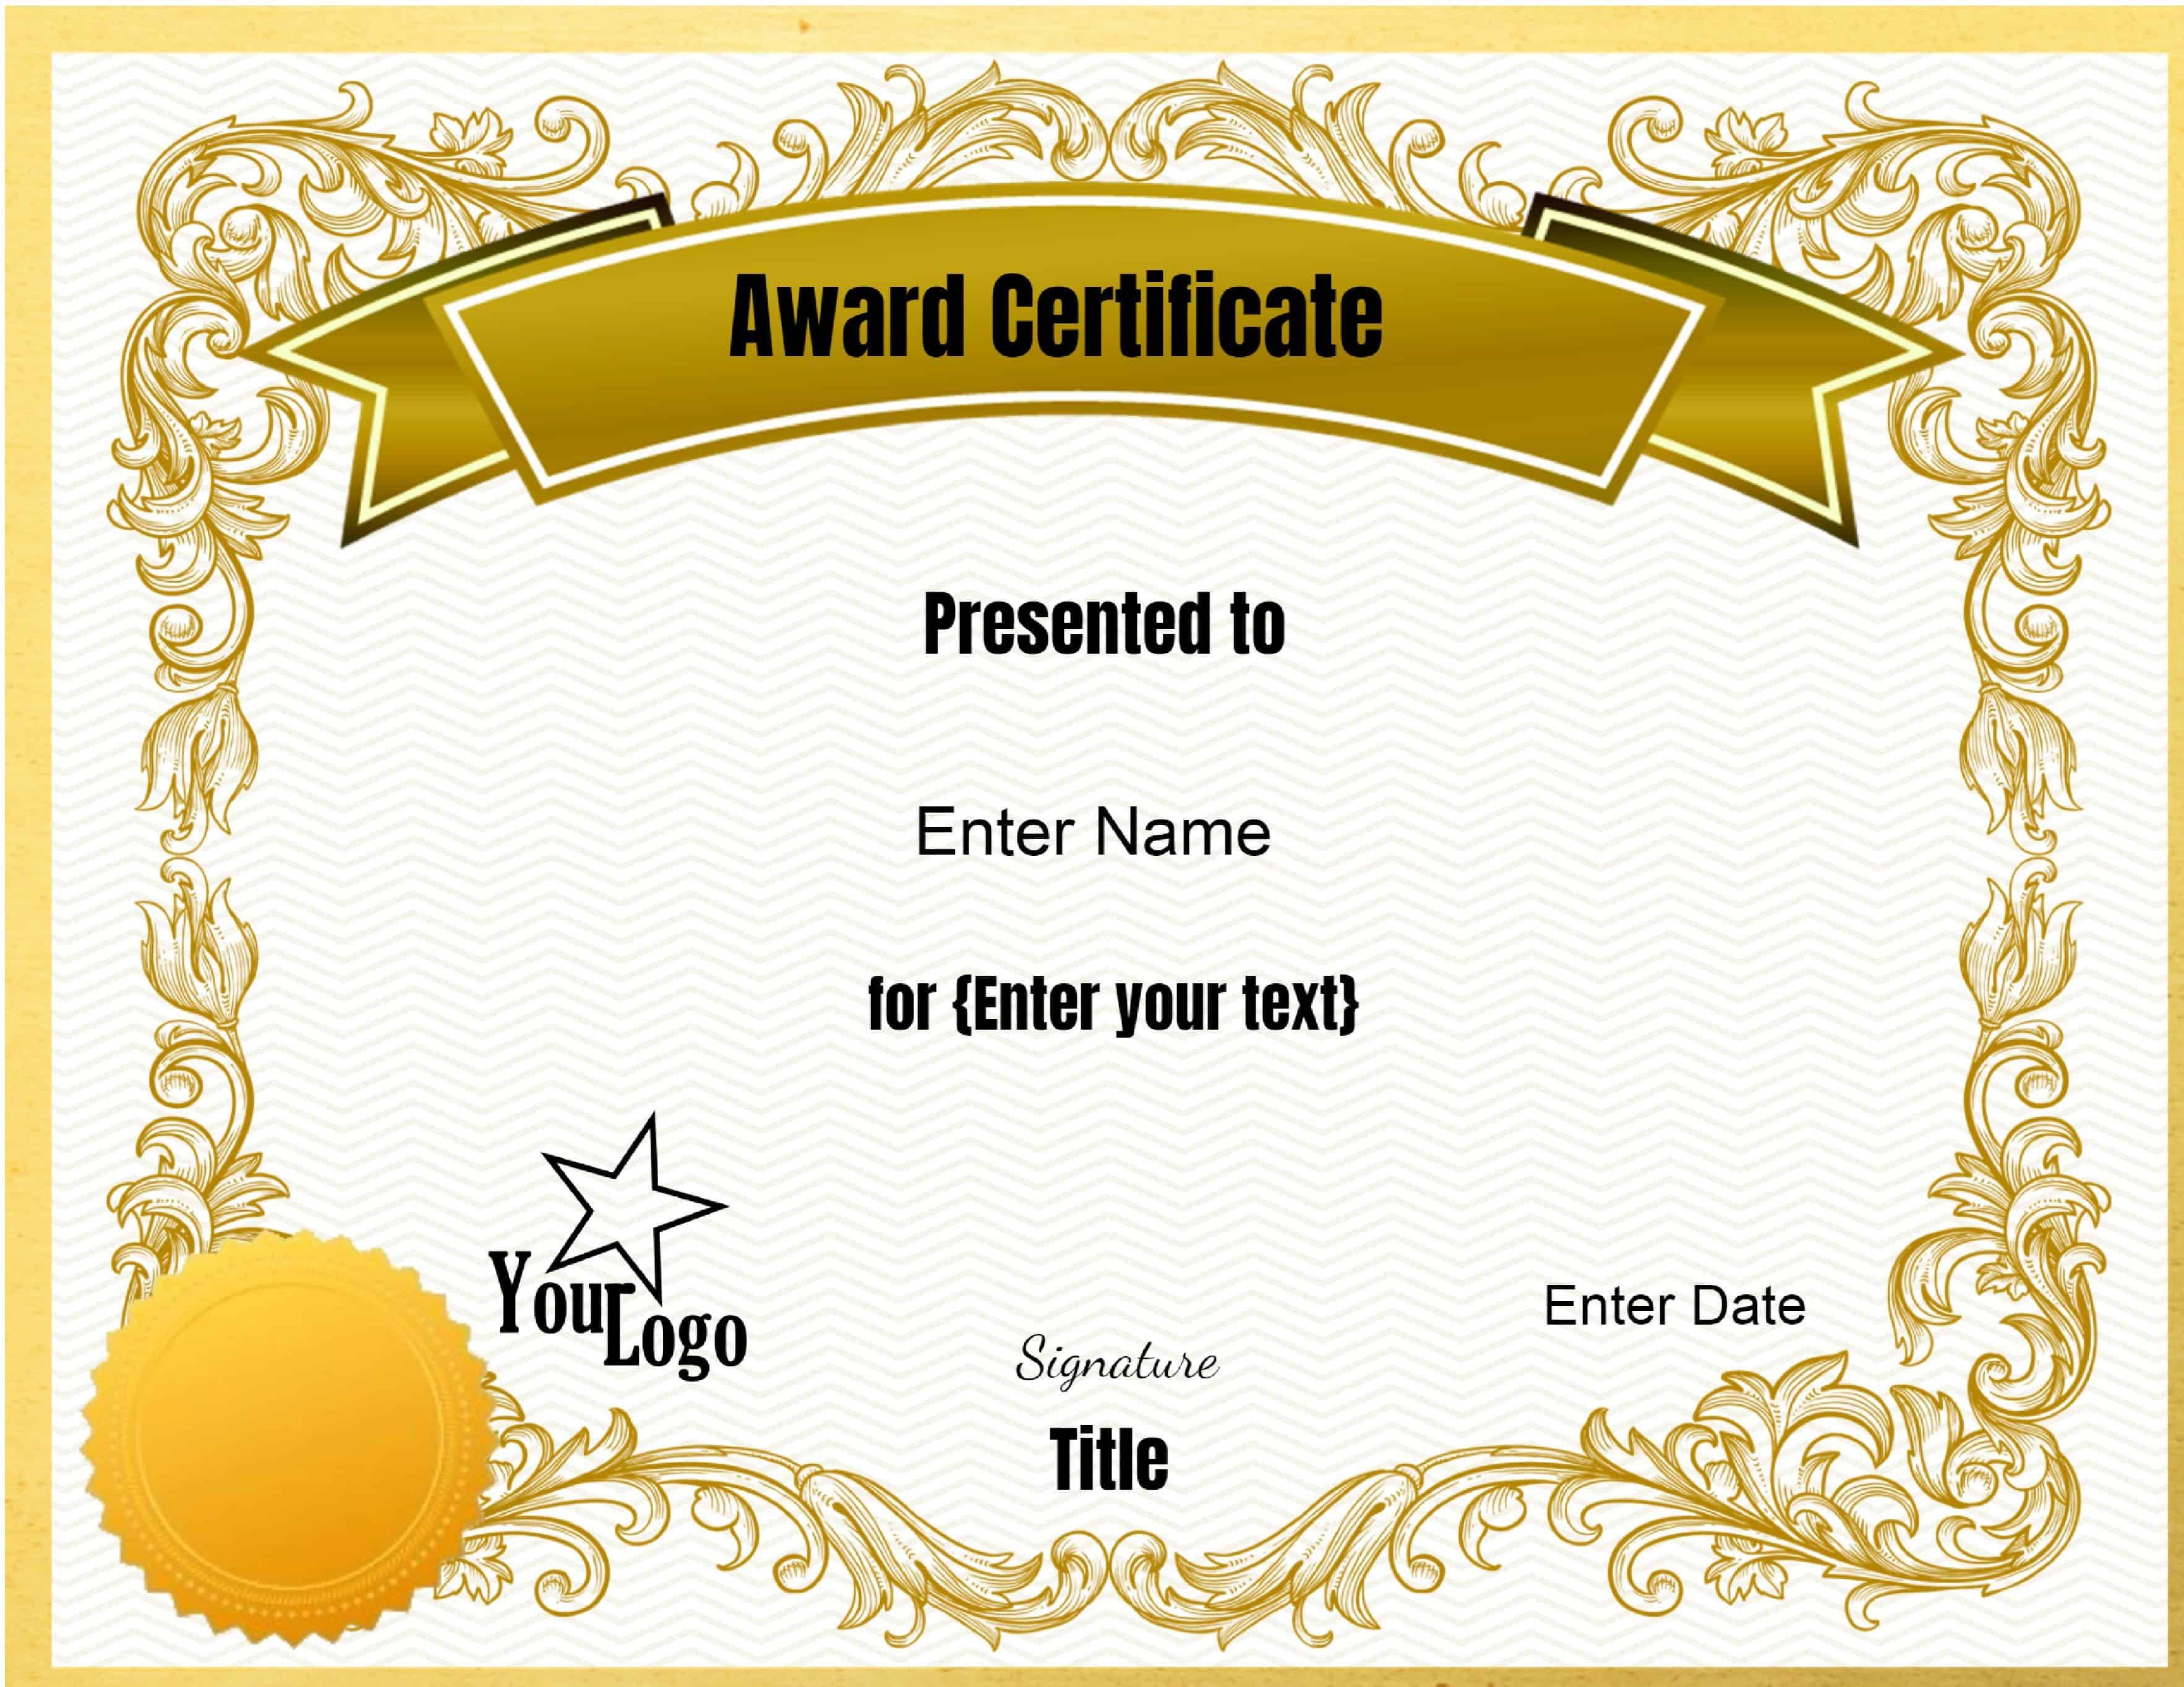 Award Certificate Template Free Free Editable Certificate Template